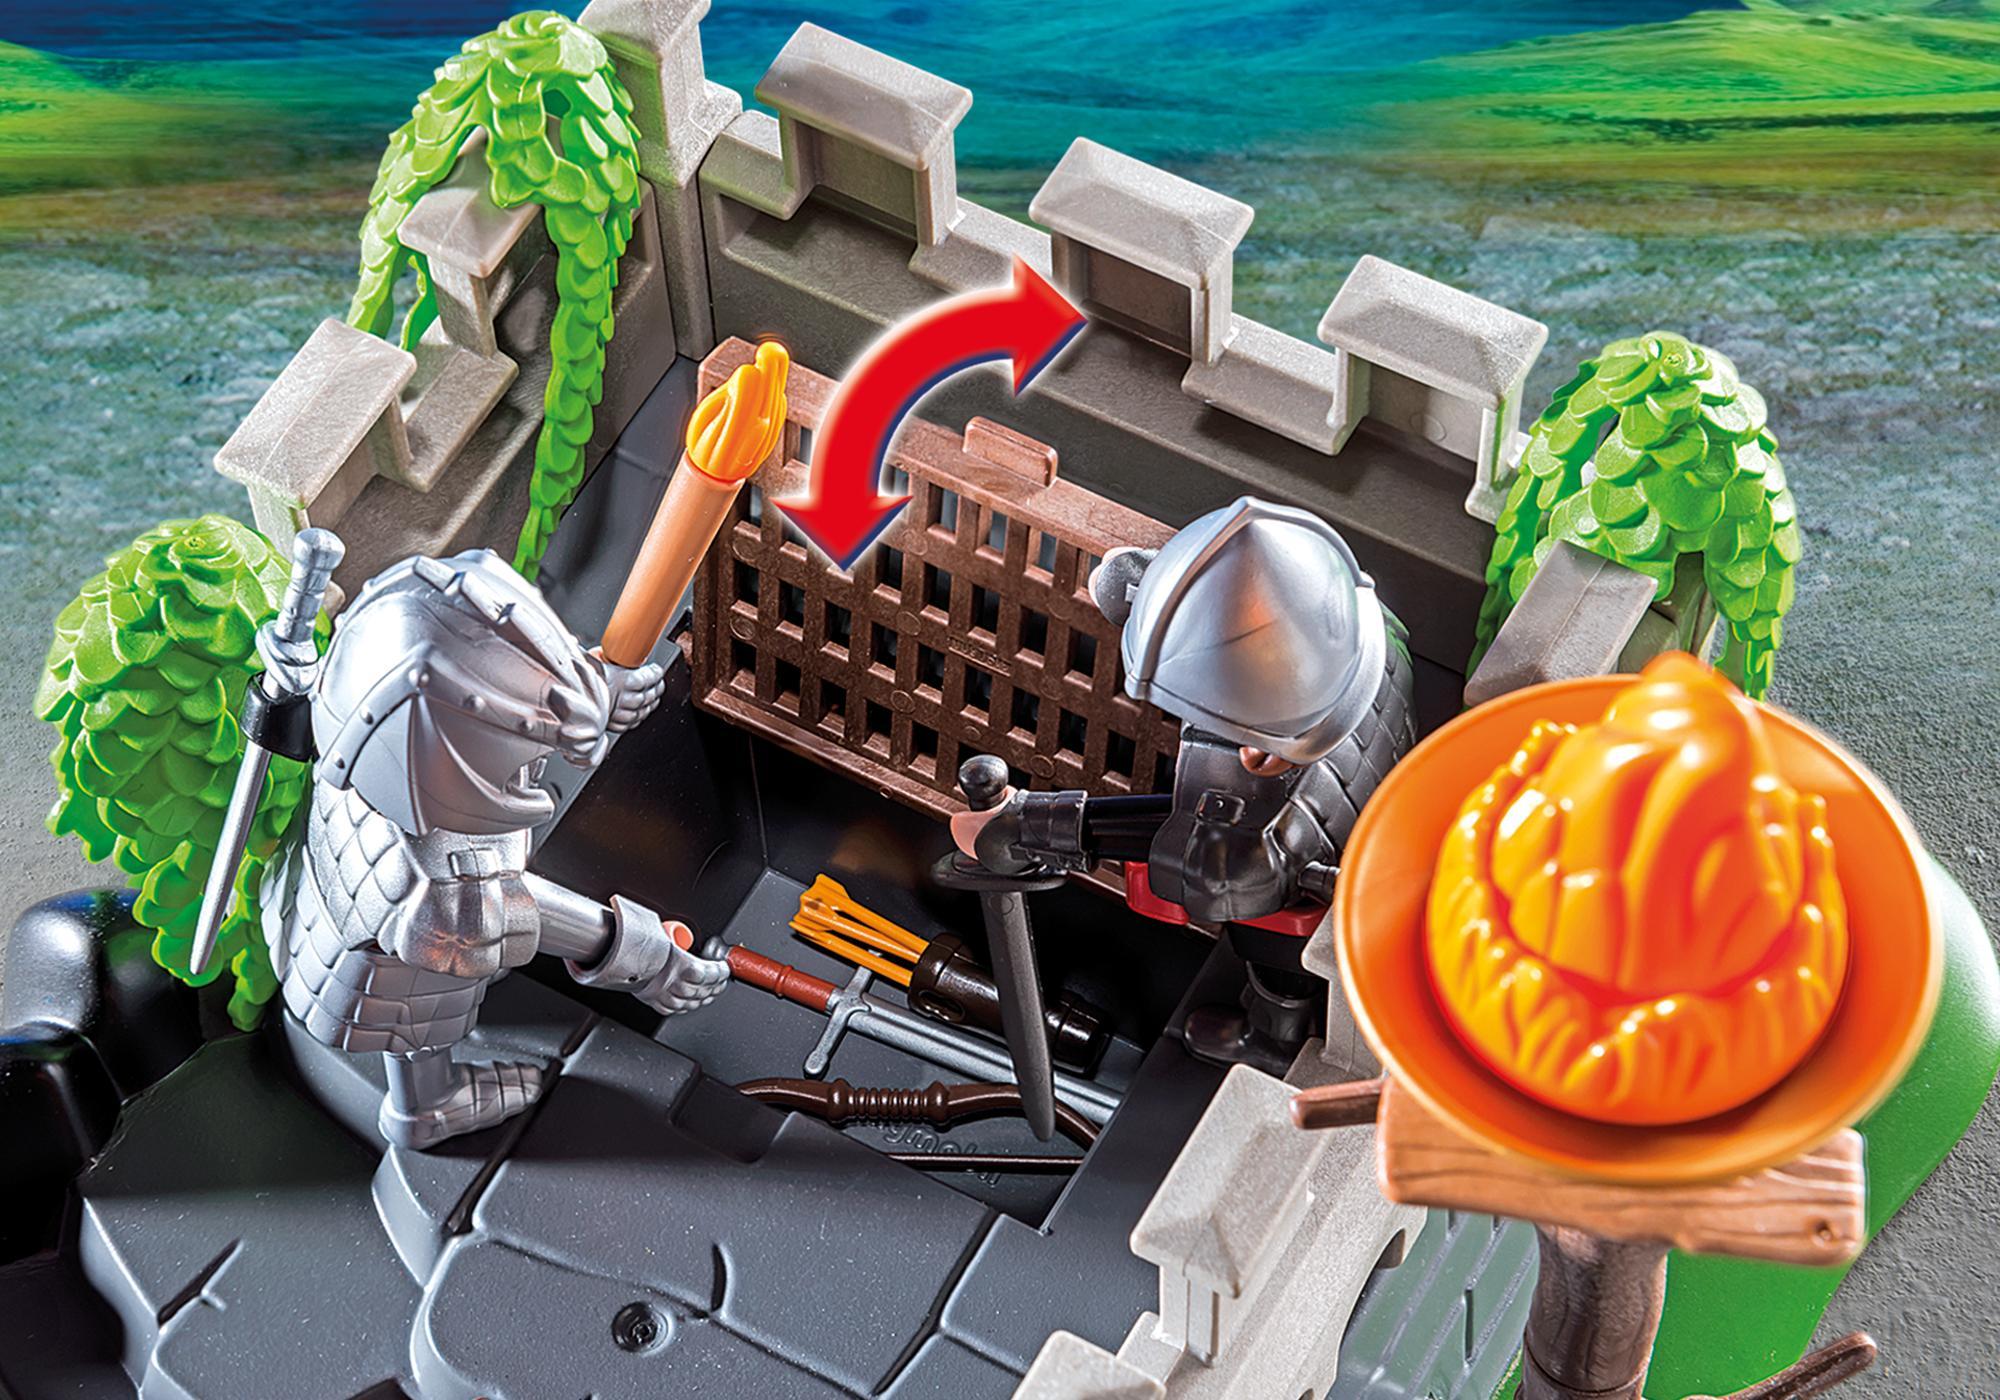 http://media.playmobil.com/i/playmobil/6627_product_extra1/Drachenritter-Bastion